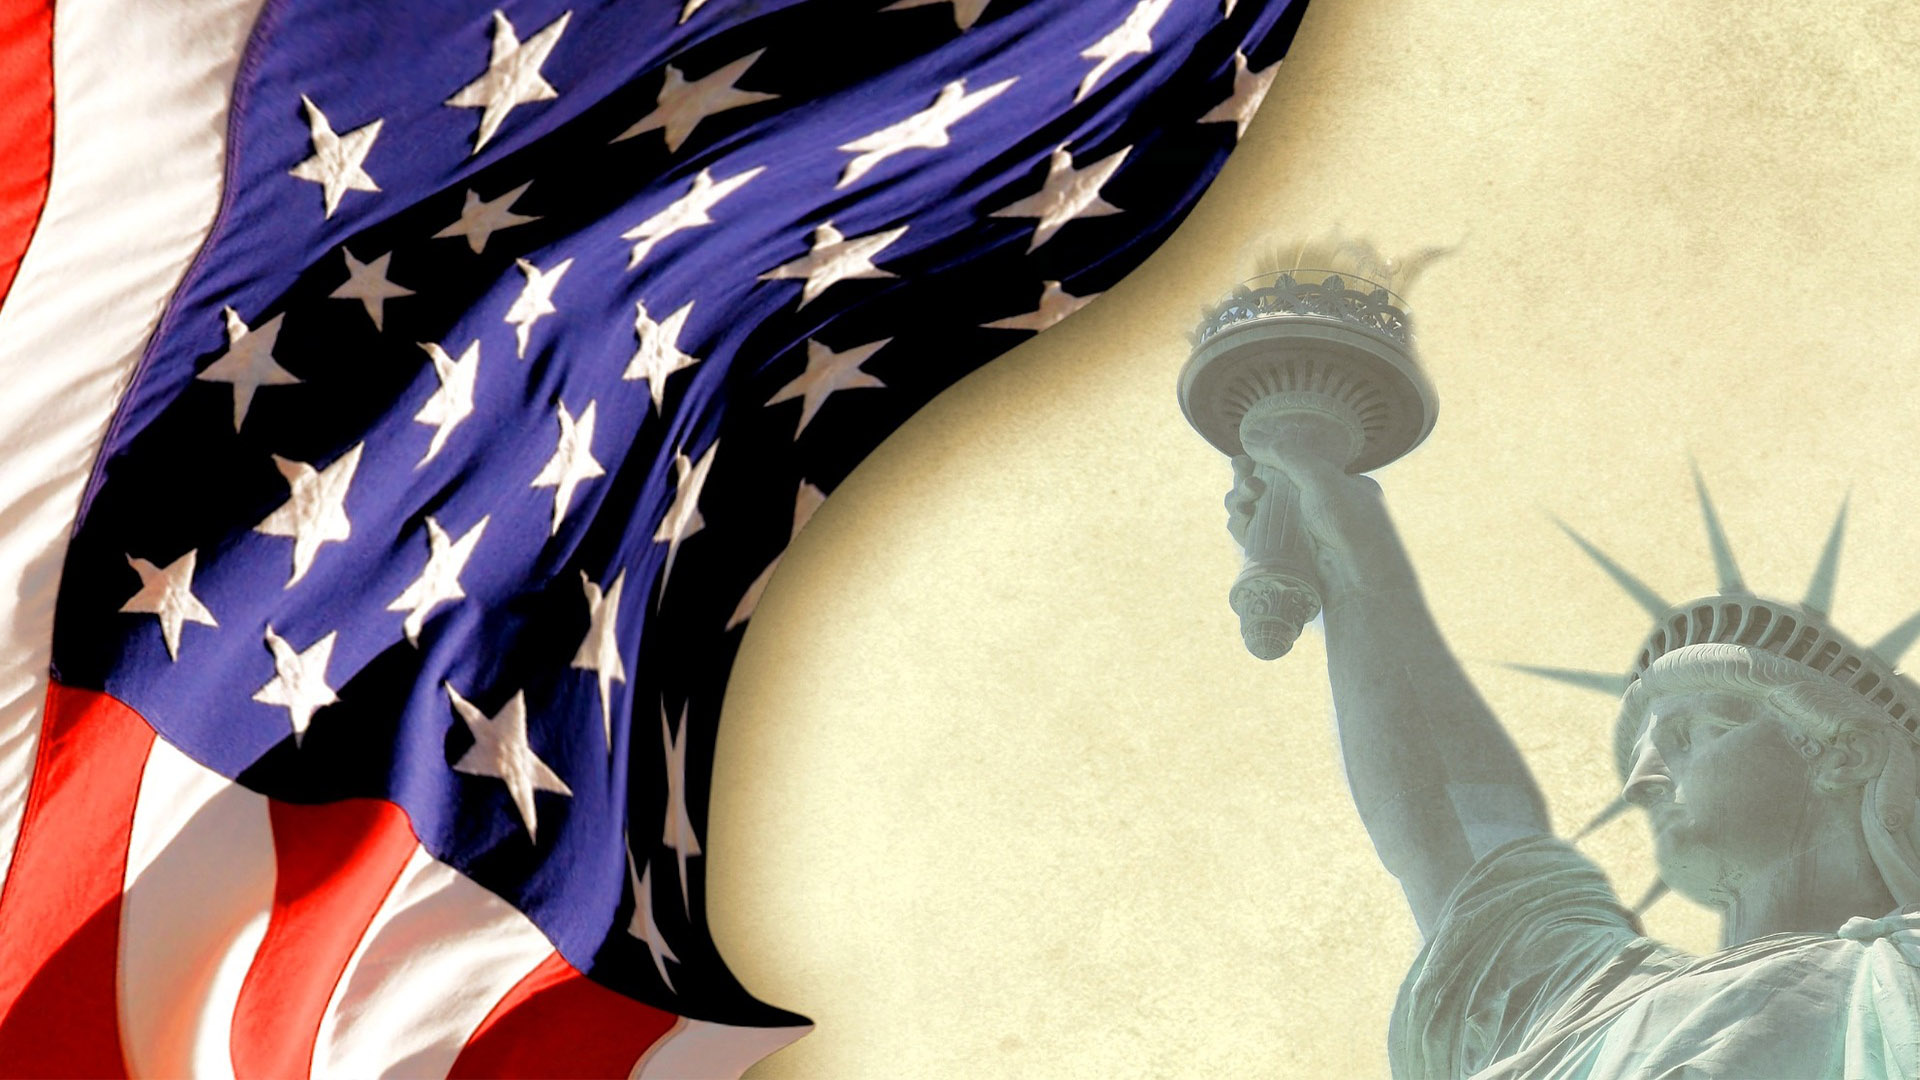 visto-americano-de-turista-1  Visto Americano